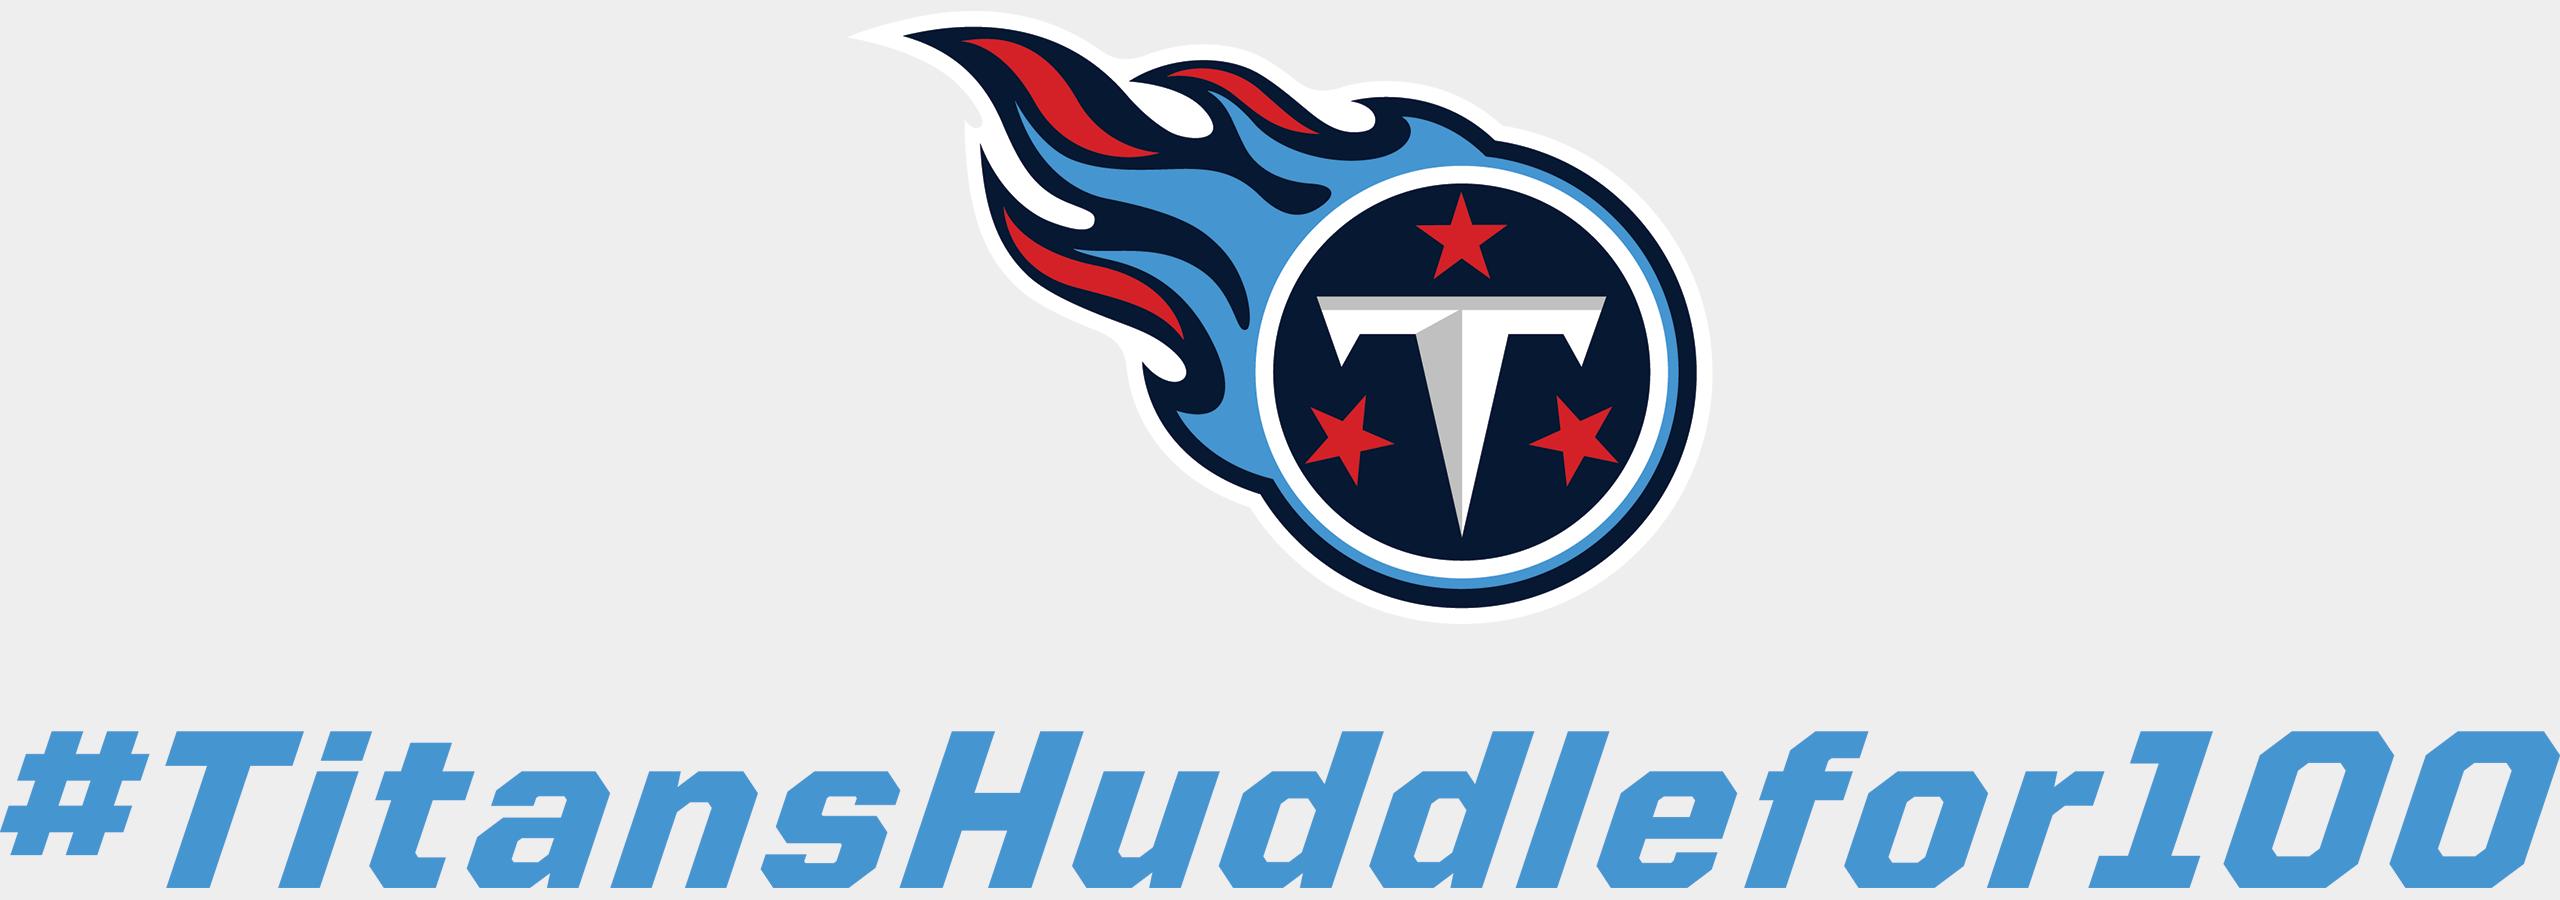 hashtag-huddle-for-100